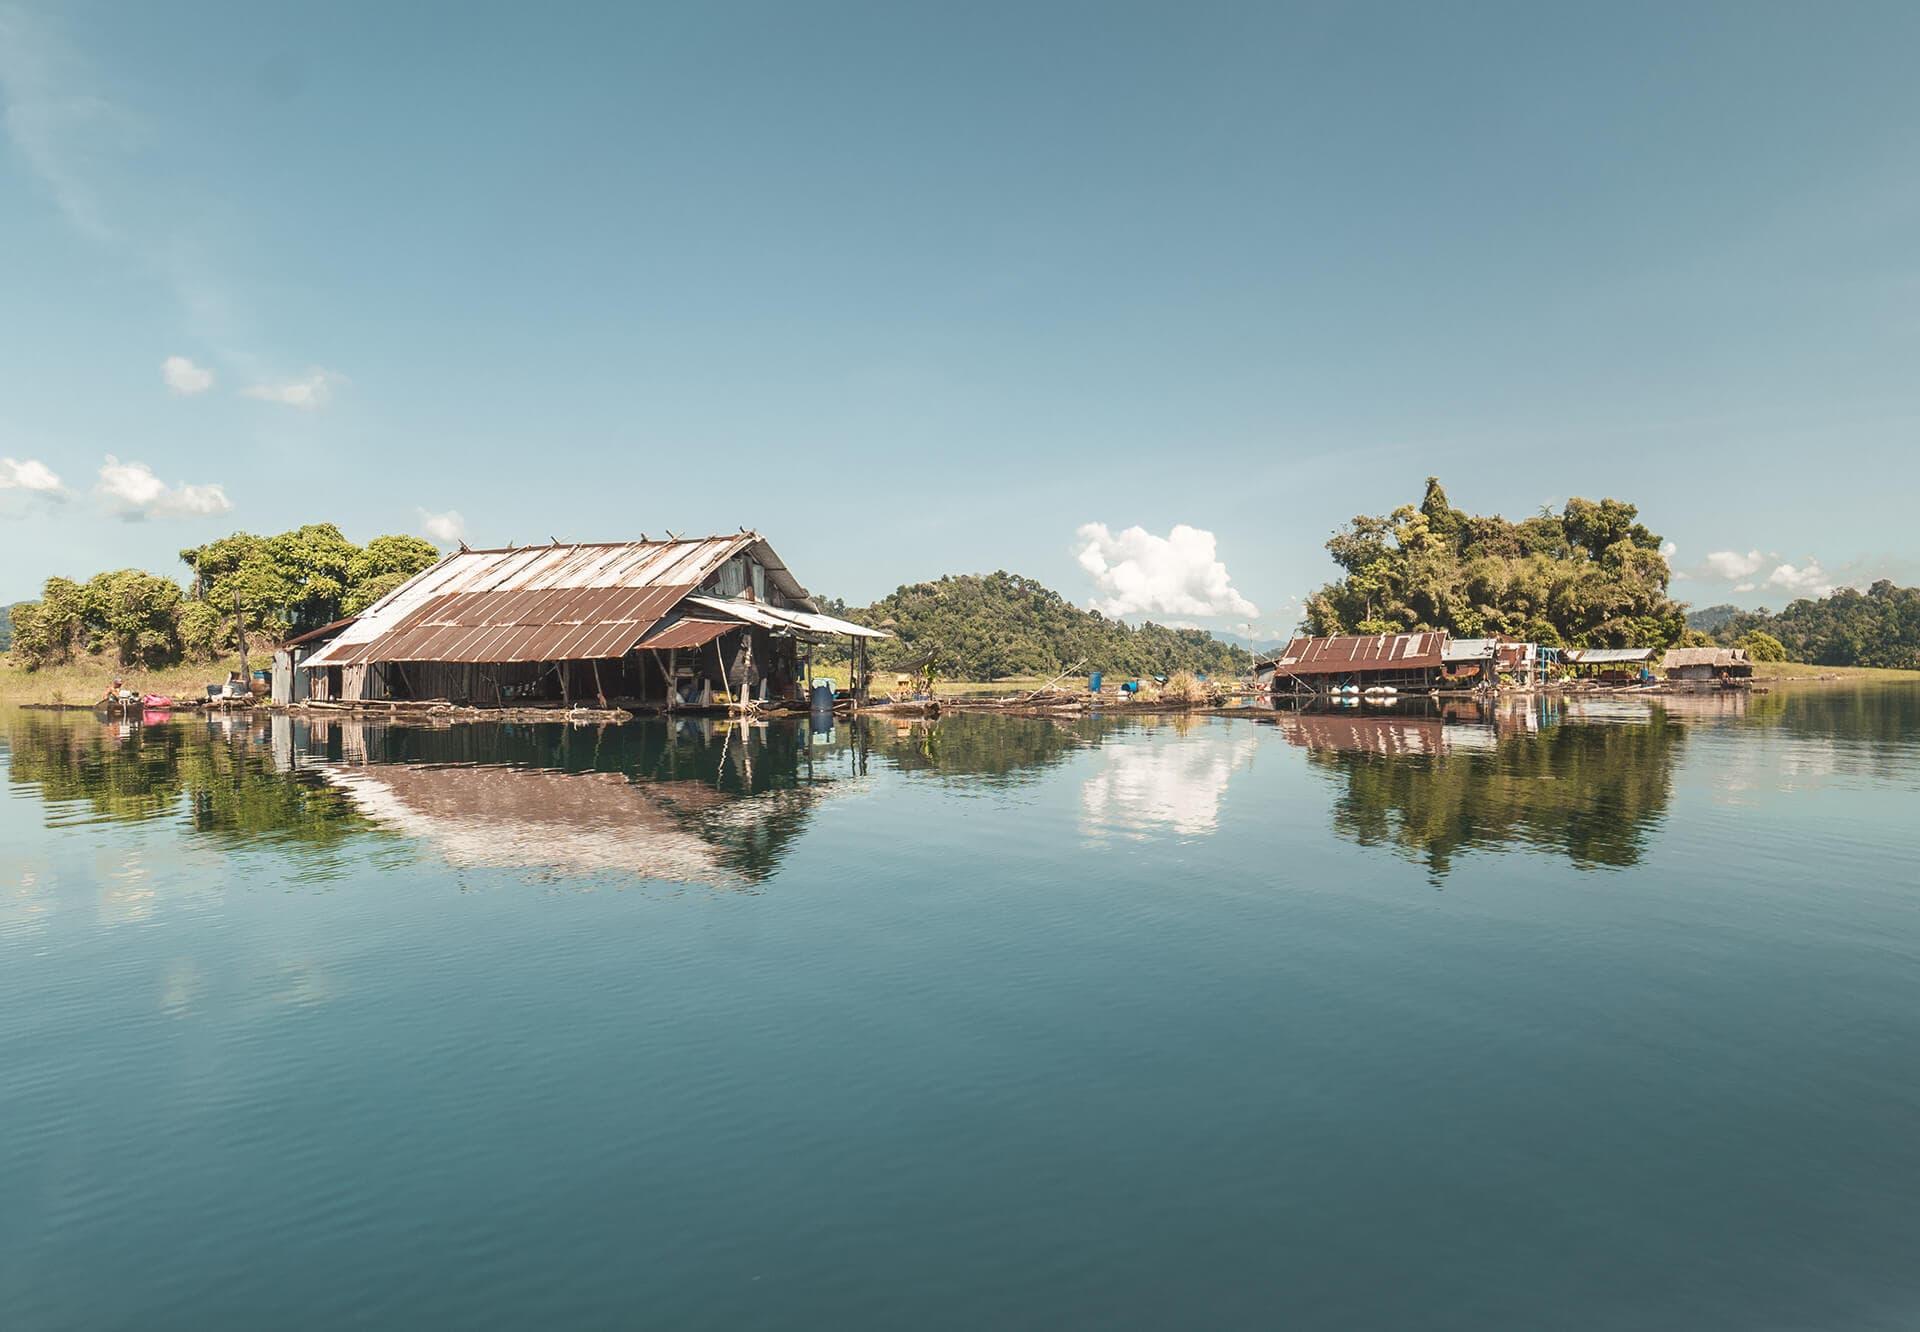 Khao sok lake tour local villages